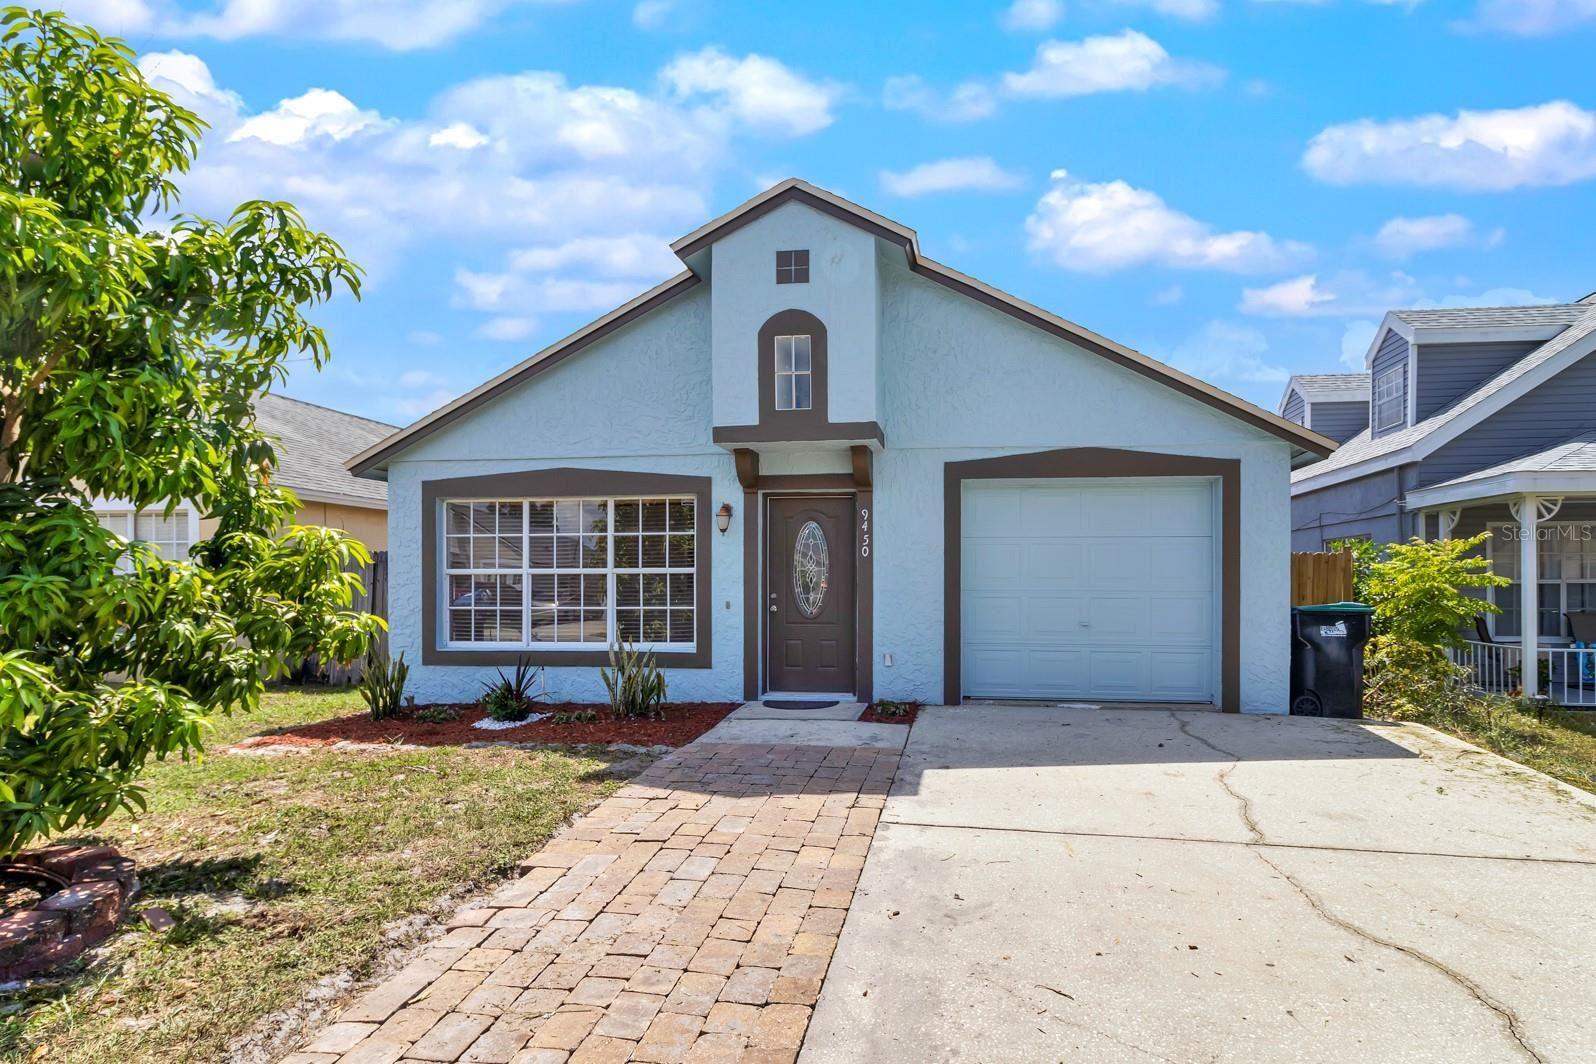 9450 DEARMONT AVENUE, Orlando, FL 32825 - MLS#: O5949764